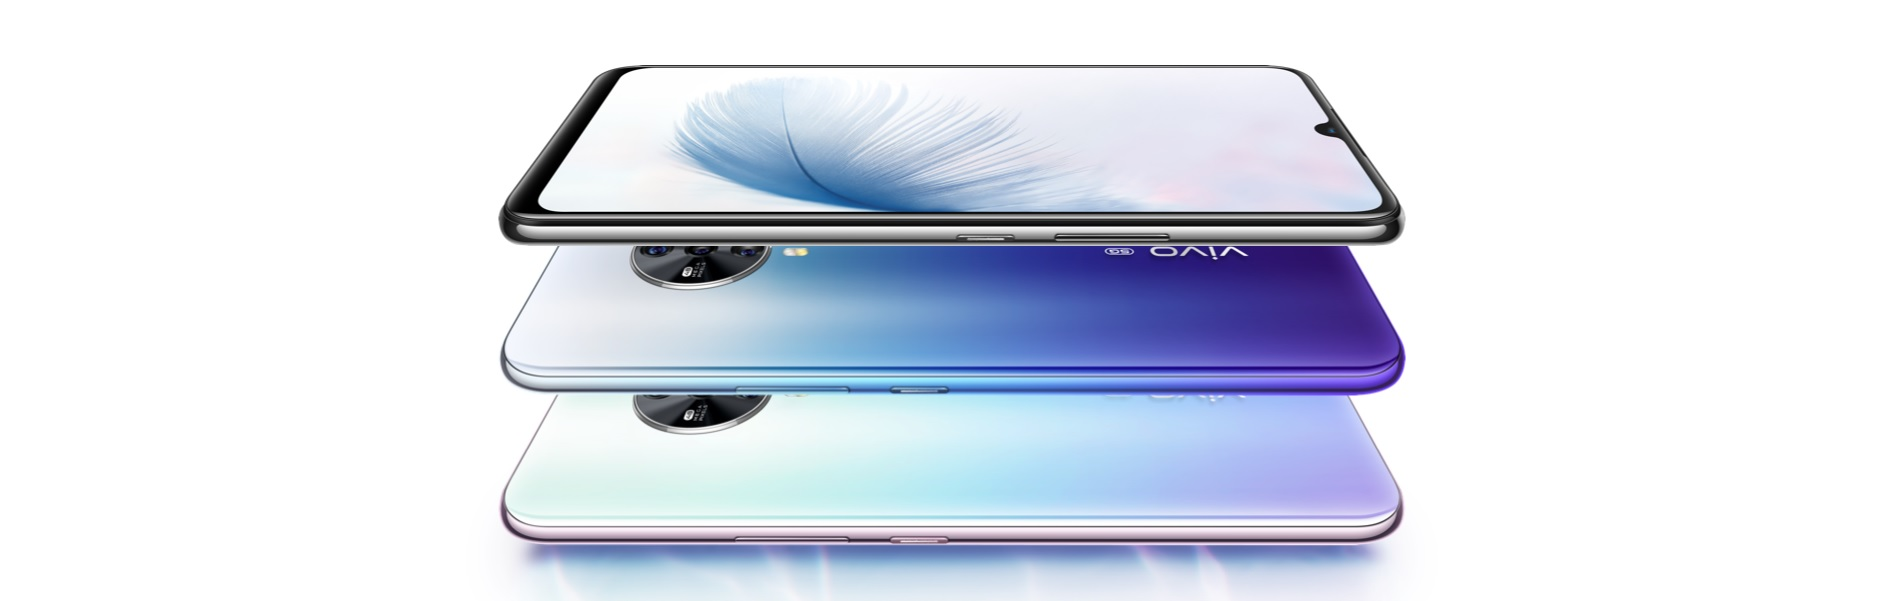 Vivo S6 5G smartphone